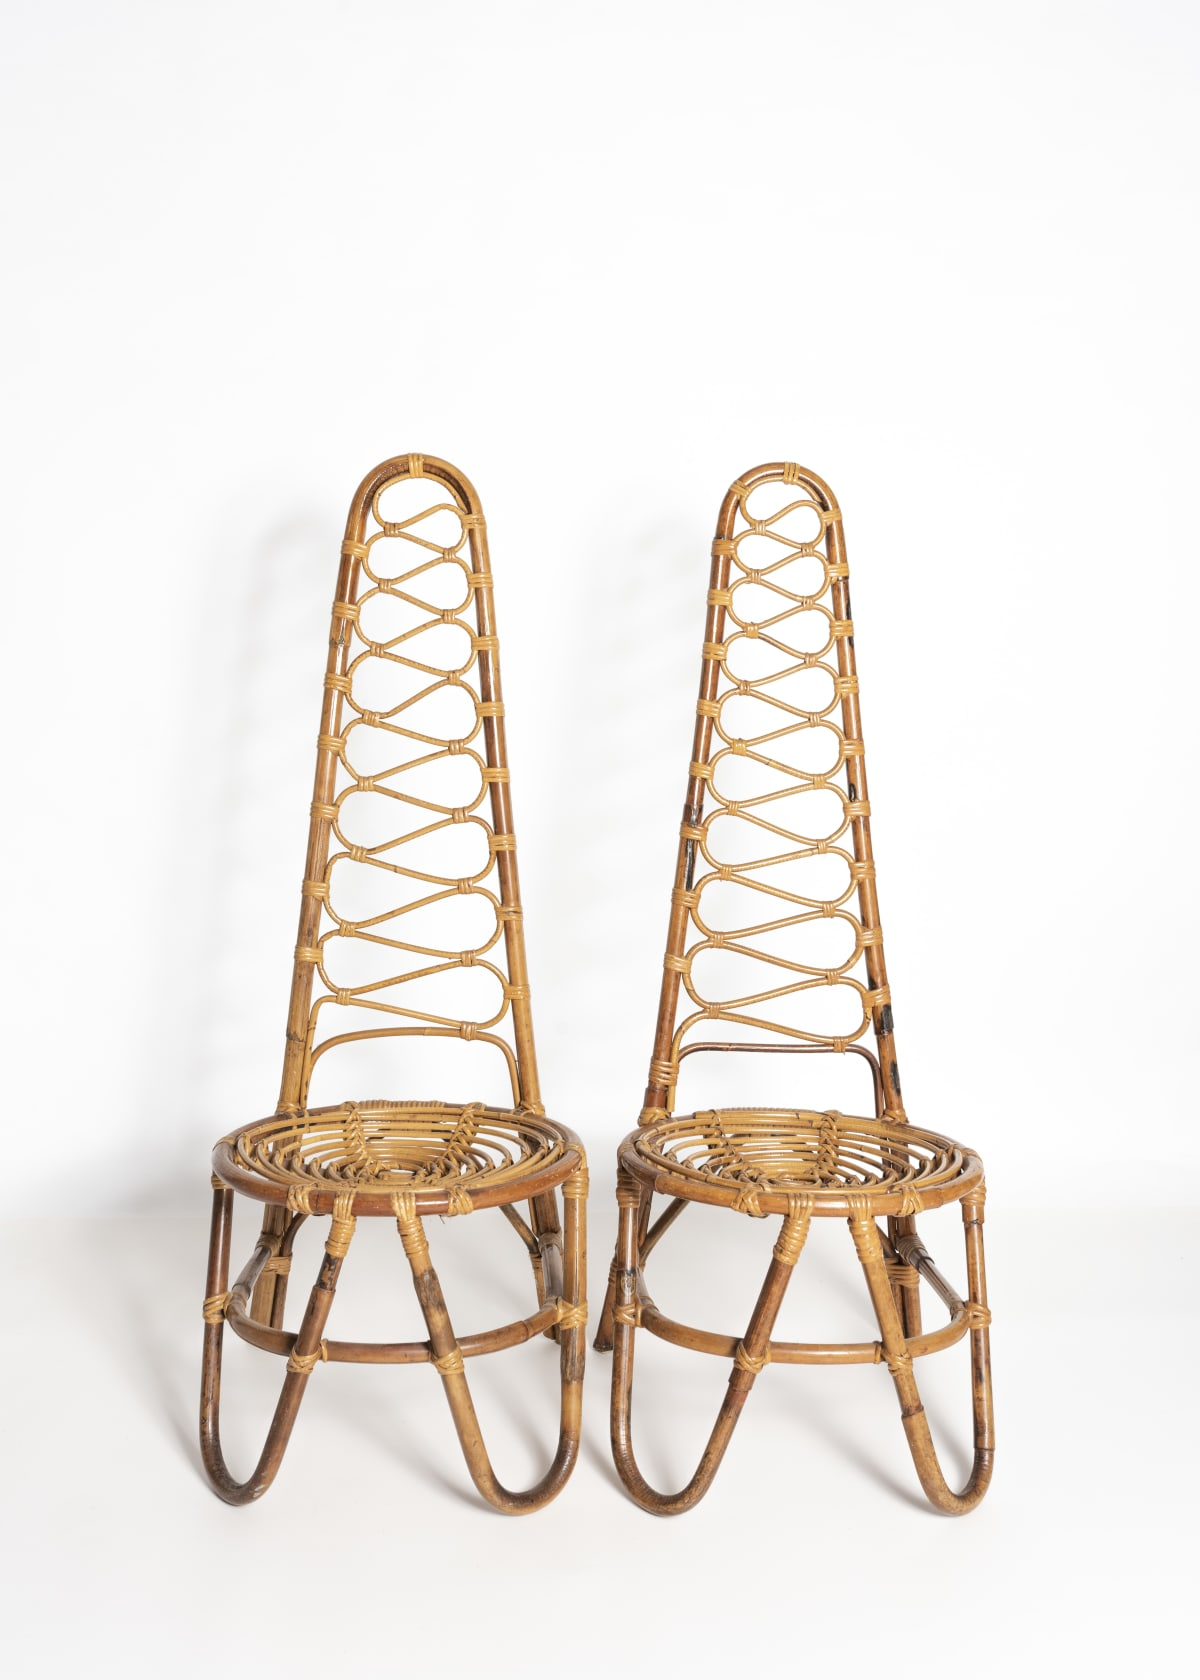 20th Century European Pair of 'Rivera' chairs Cane